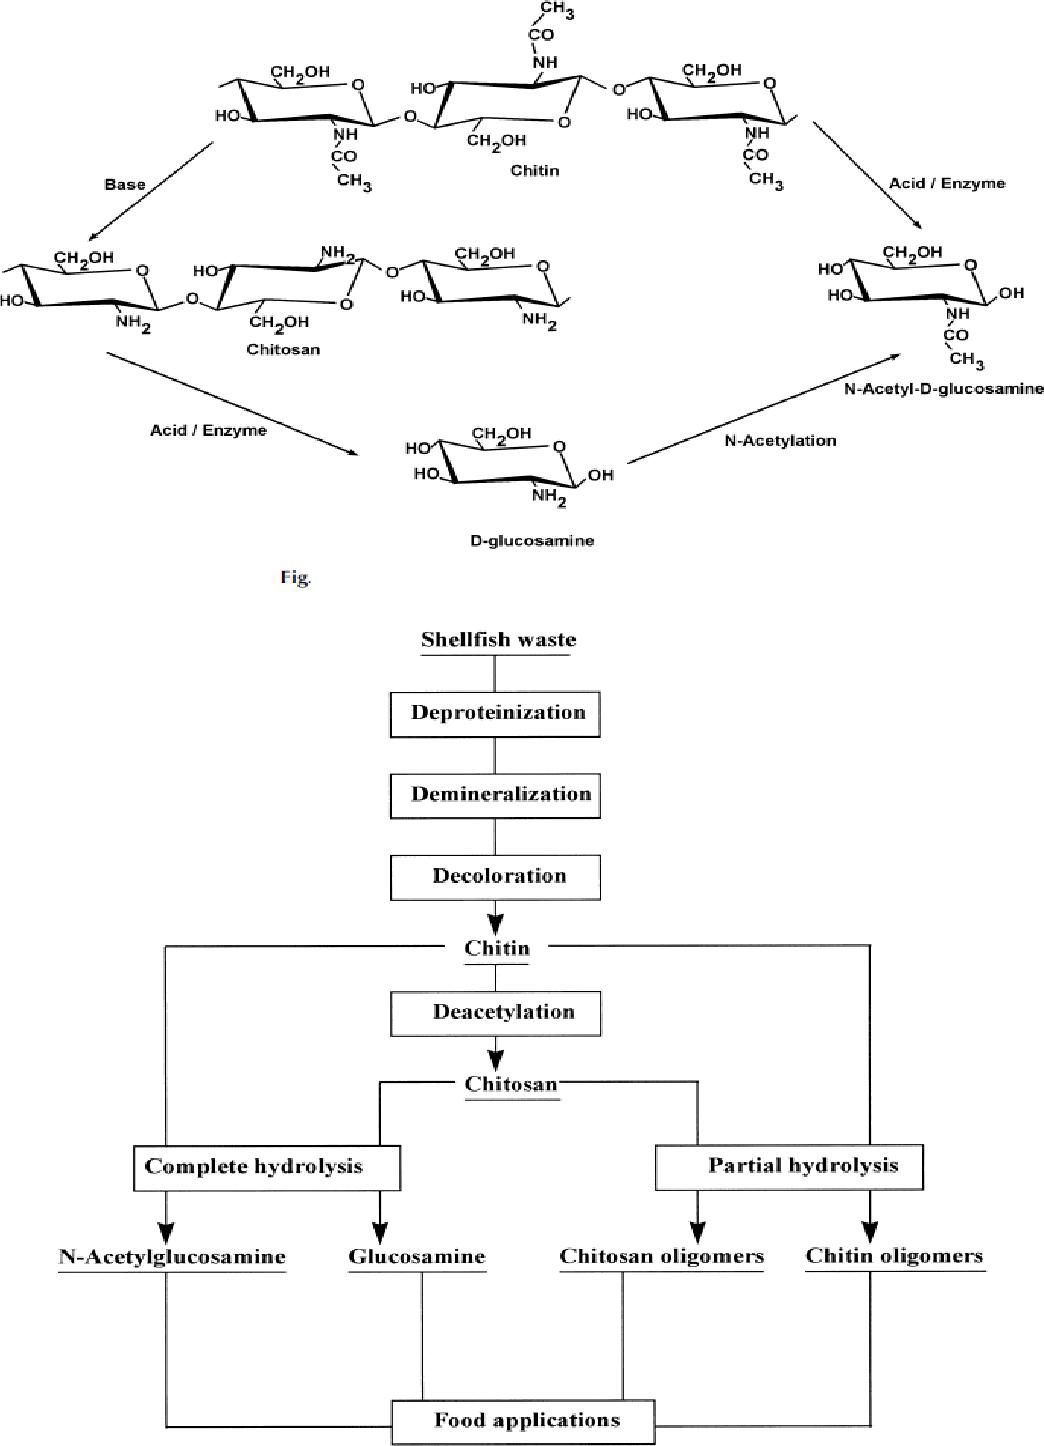 PDF] Depolymerization of Chitosan by High-Pressure Homogenization